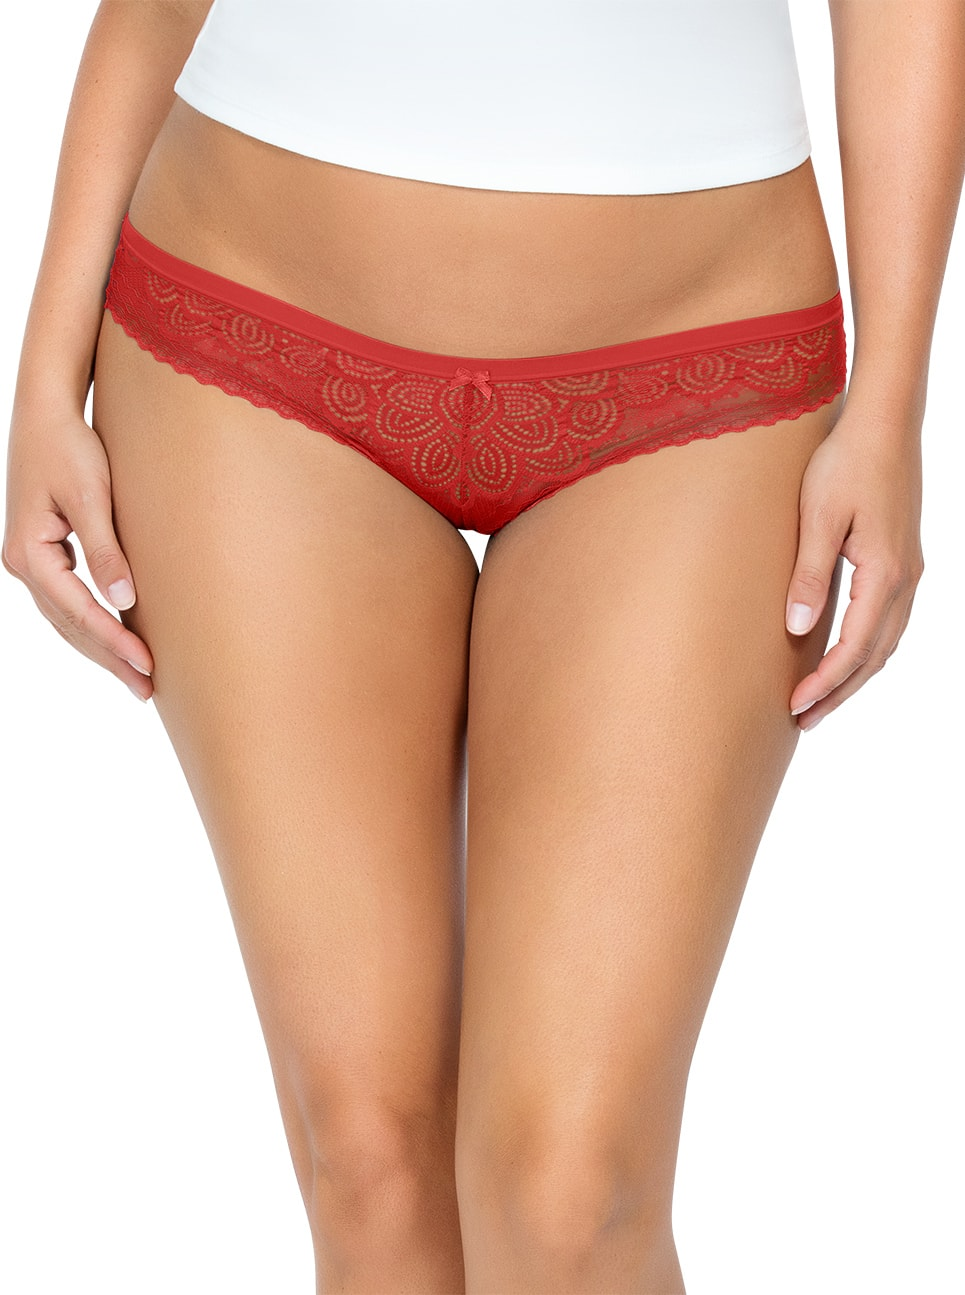 PARFAIT ParfaitPanty SoGlam BikiniPP302 Scarlette Front close - Panty So Glam Bikini - Scarlette - PP302